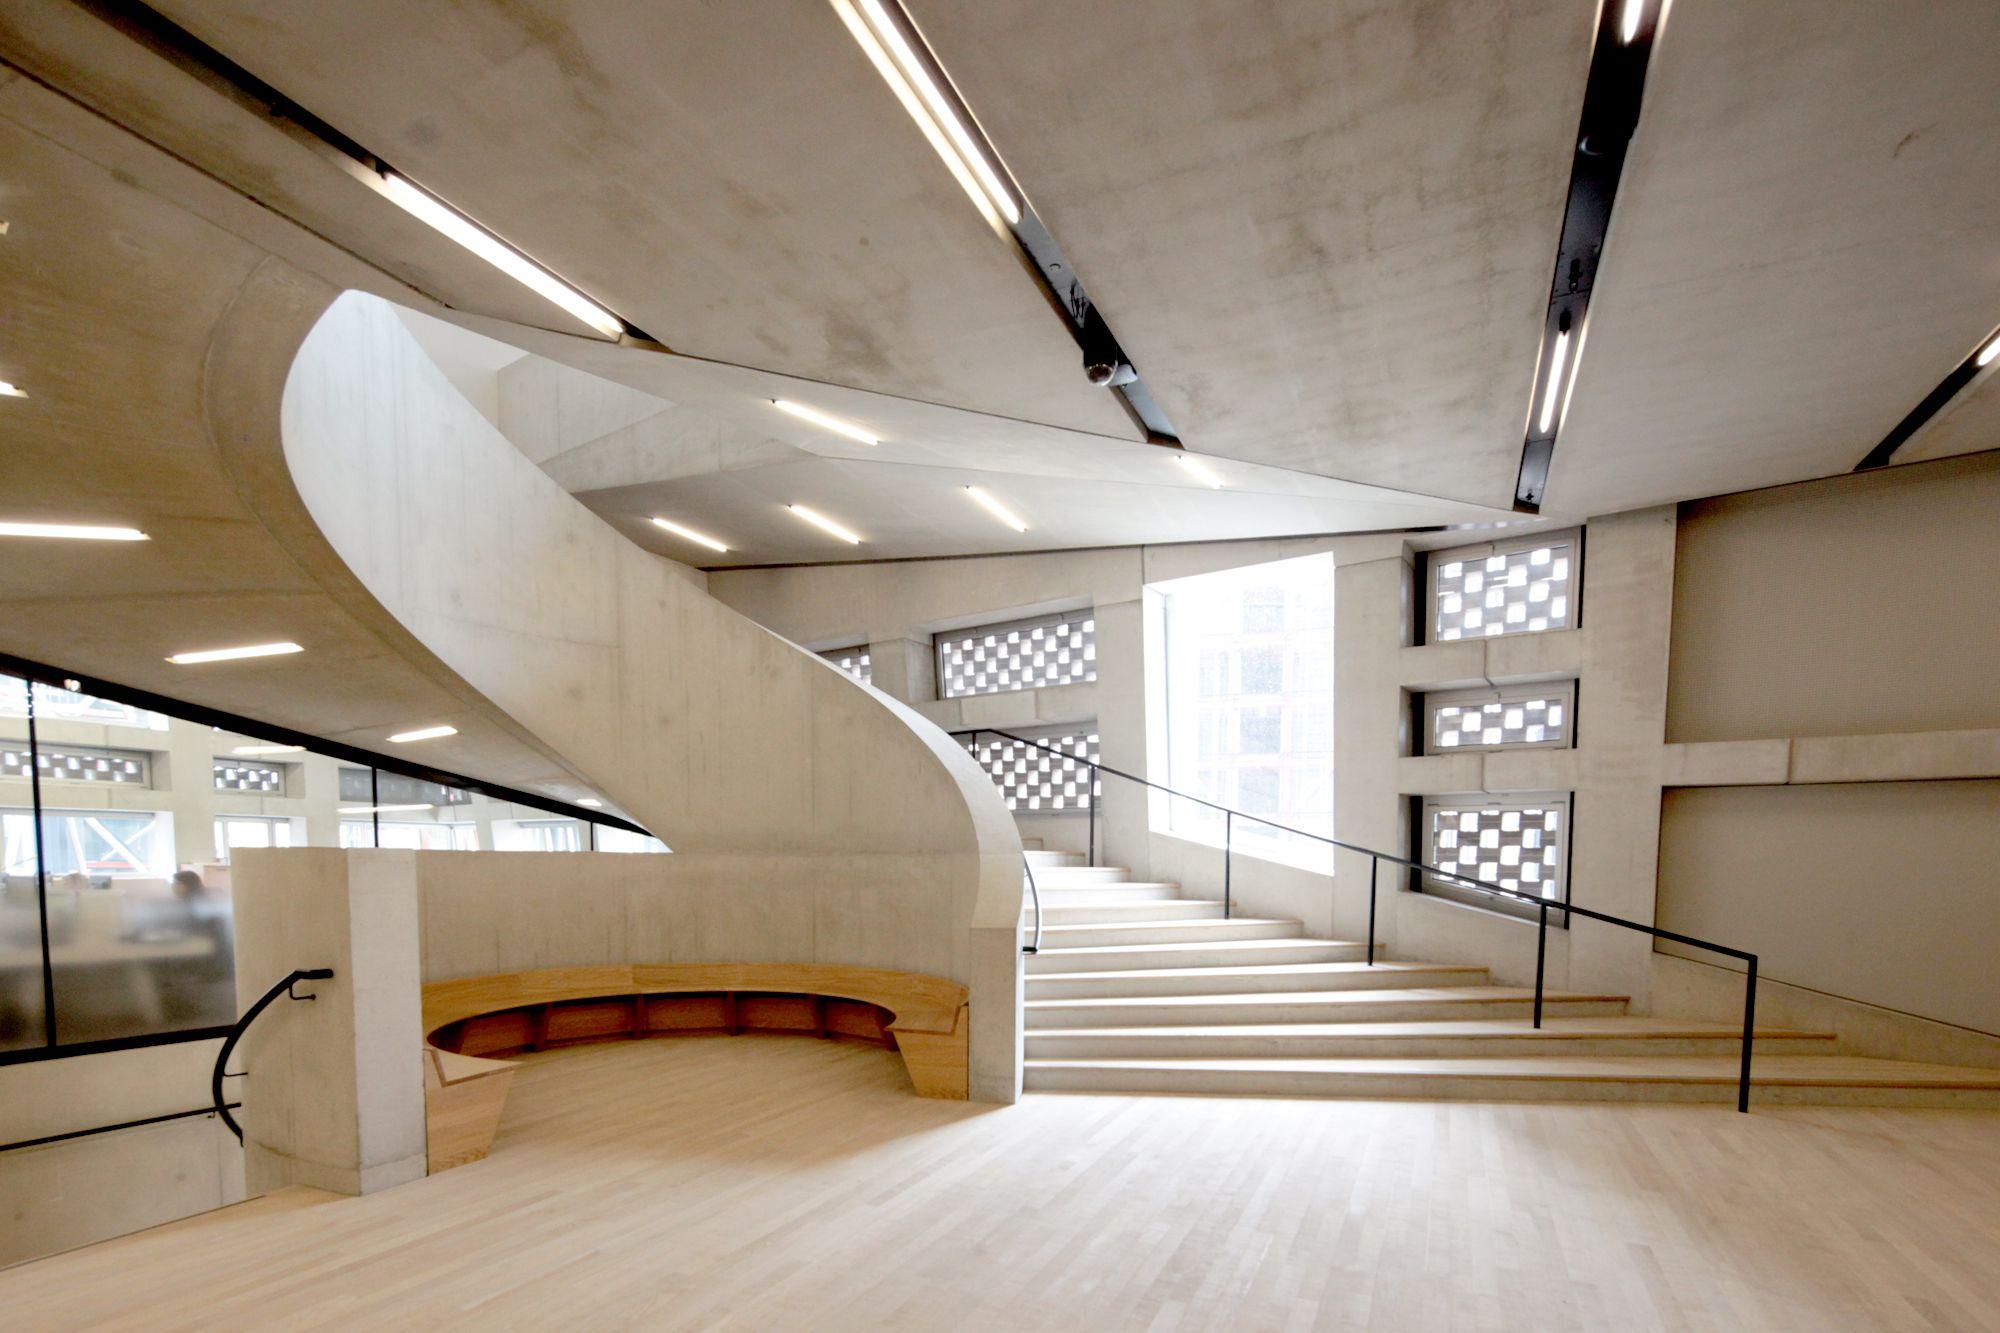 Tate Modern eröffnet Neubau von Herzog & de Meuron | Neubau ...